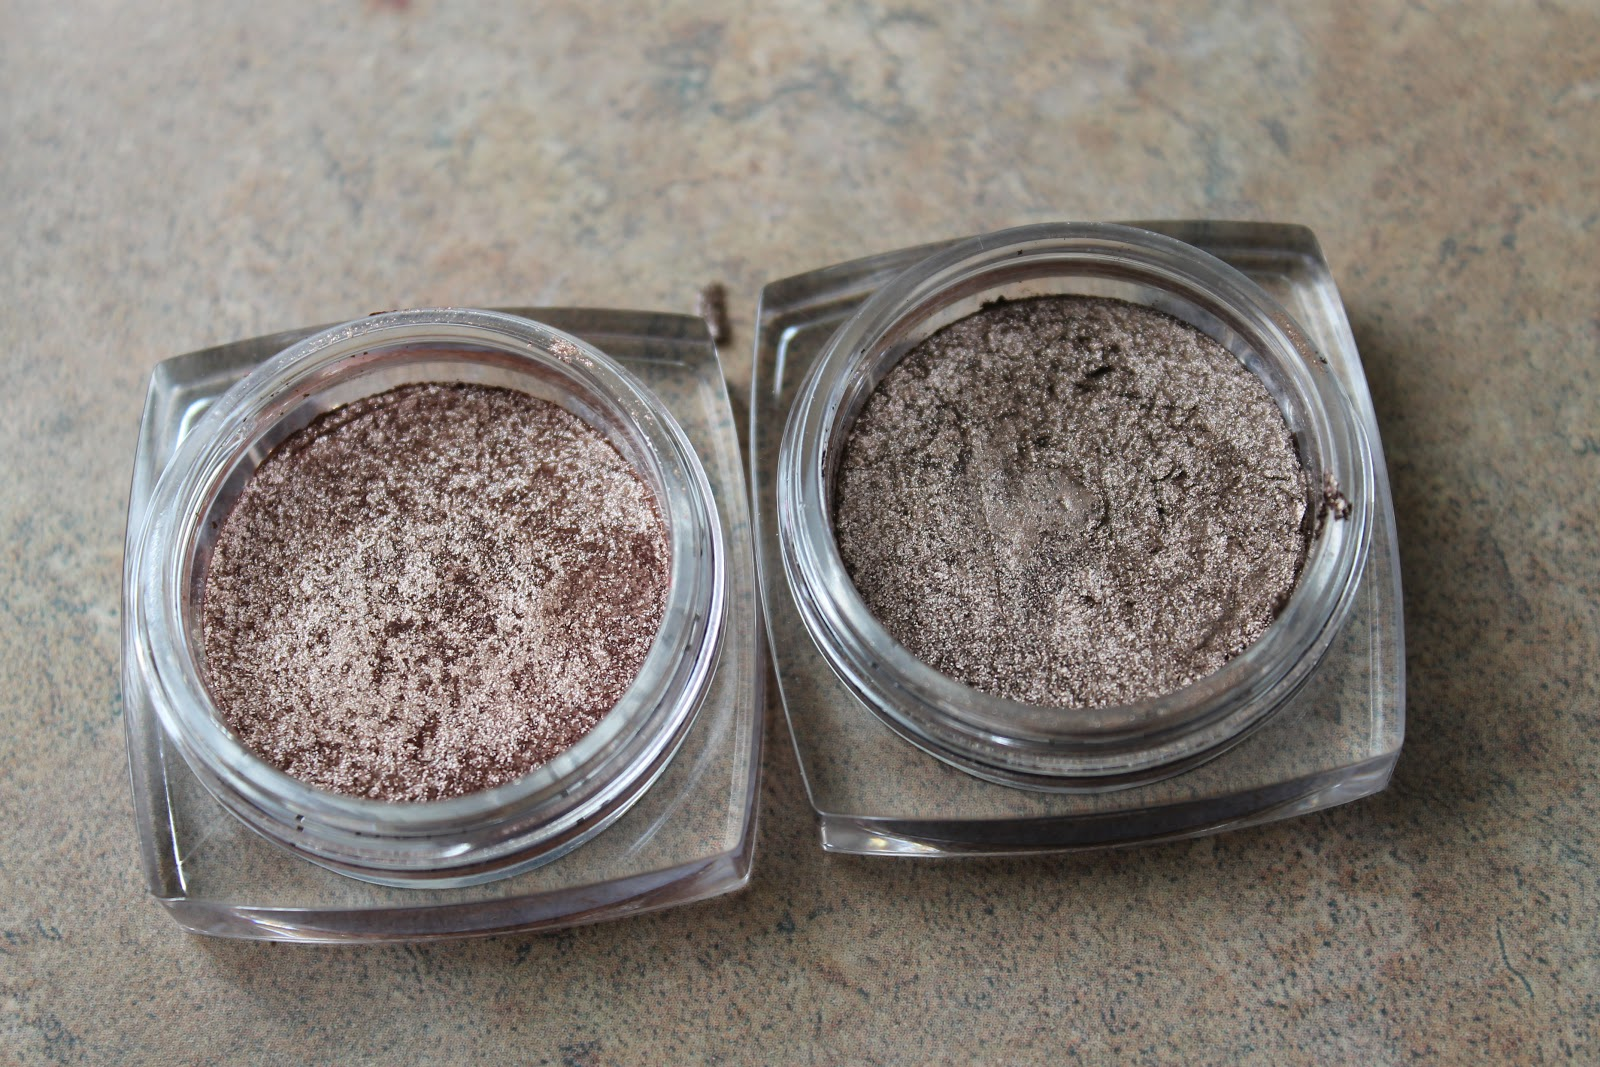 DiamondsandPearls Beauty Blog: L'Oreal Infallible Eyeshadows in Amber Rush & Bronzed Taupe ...